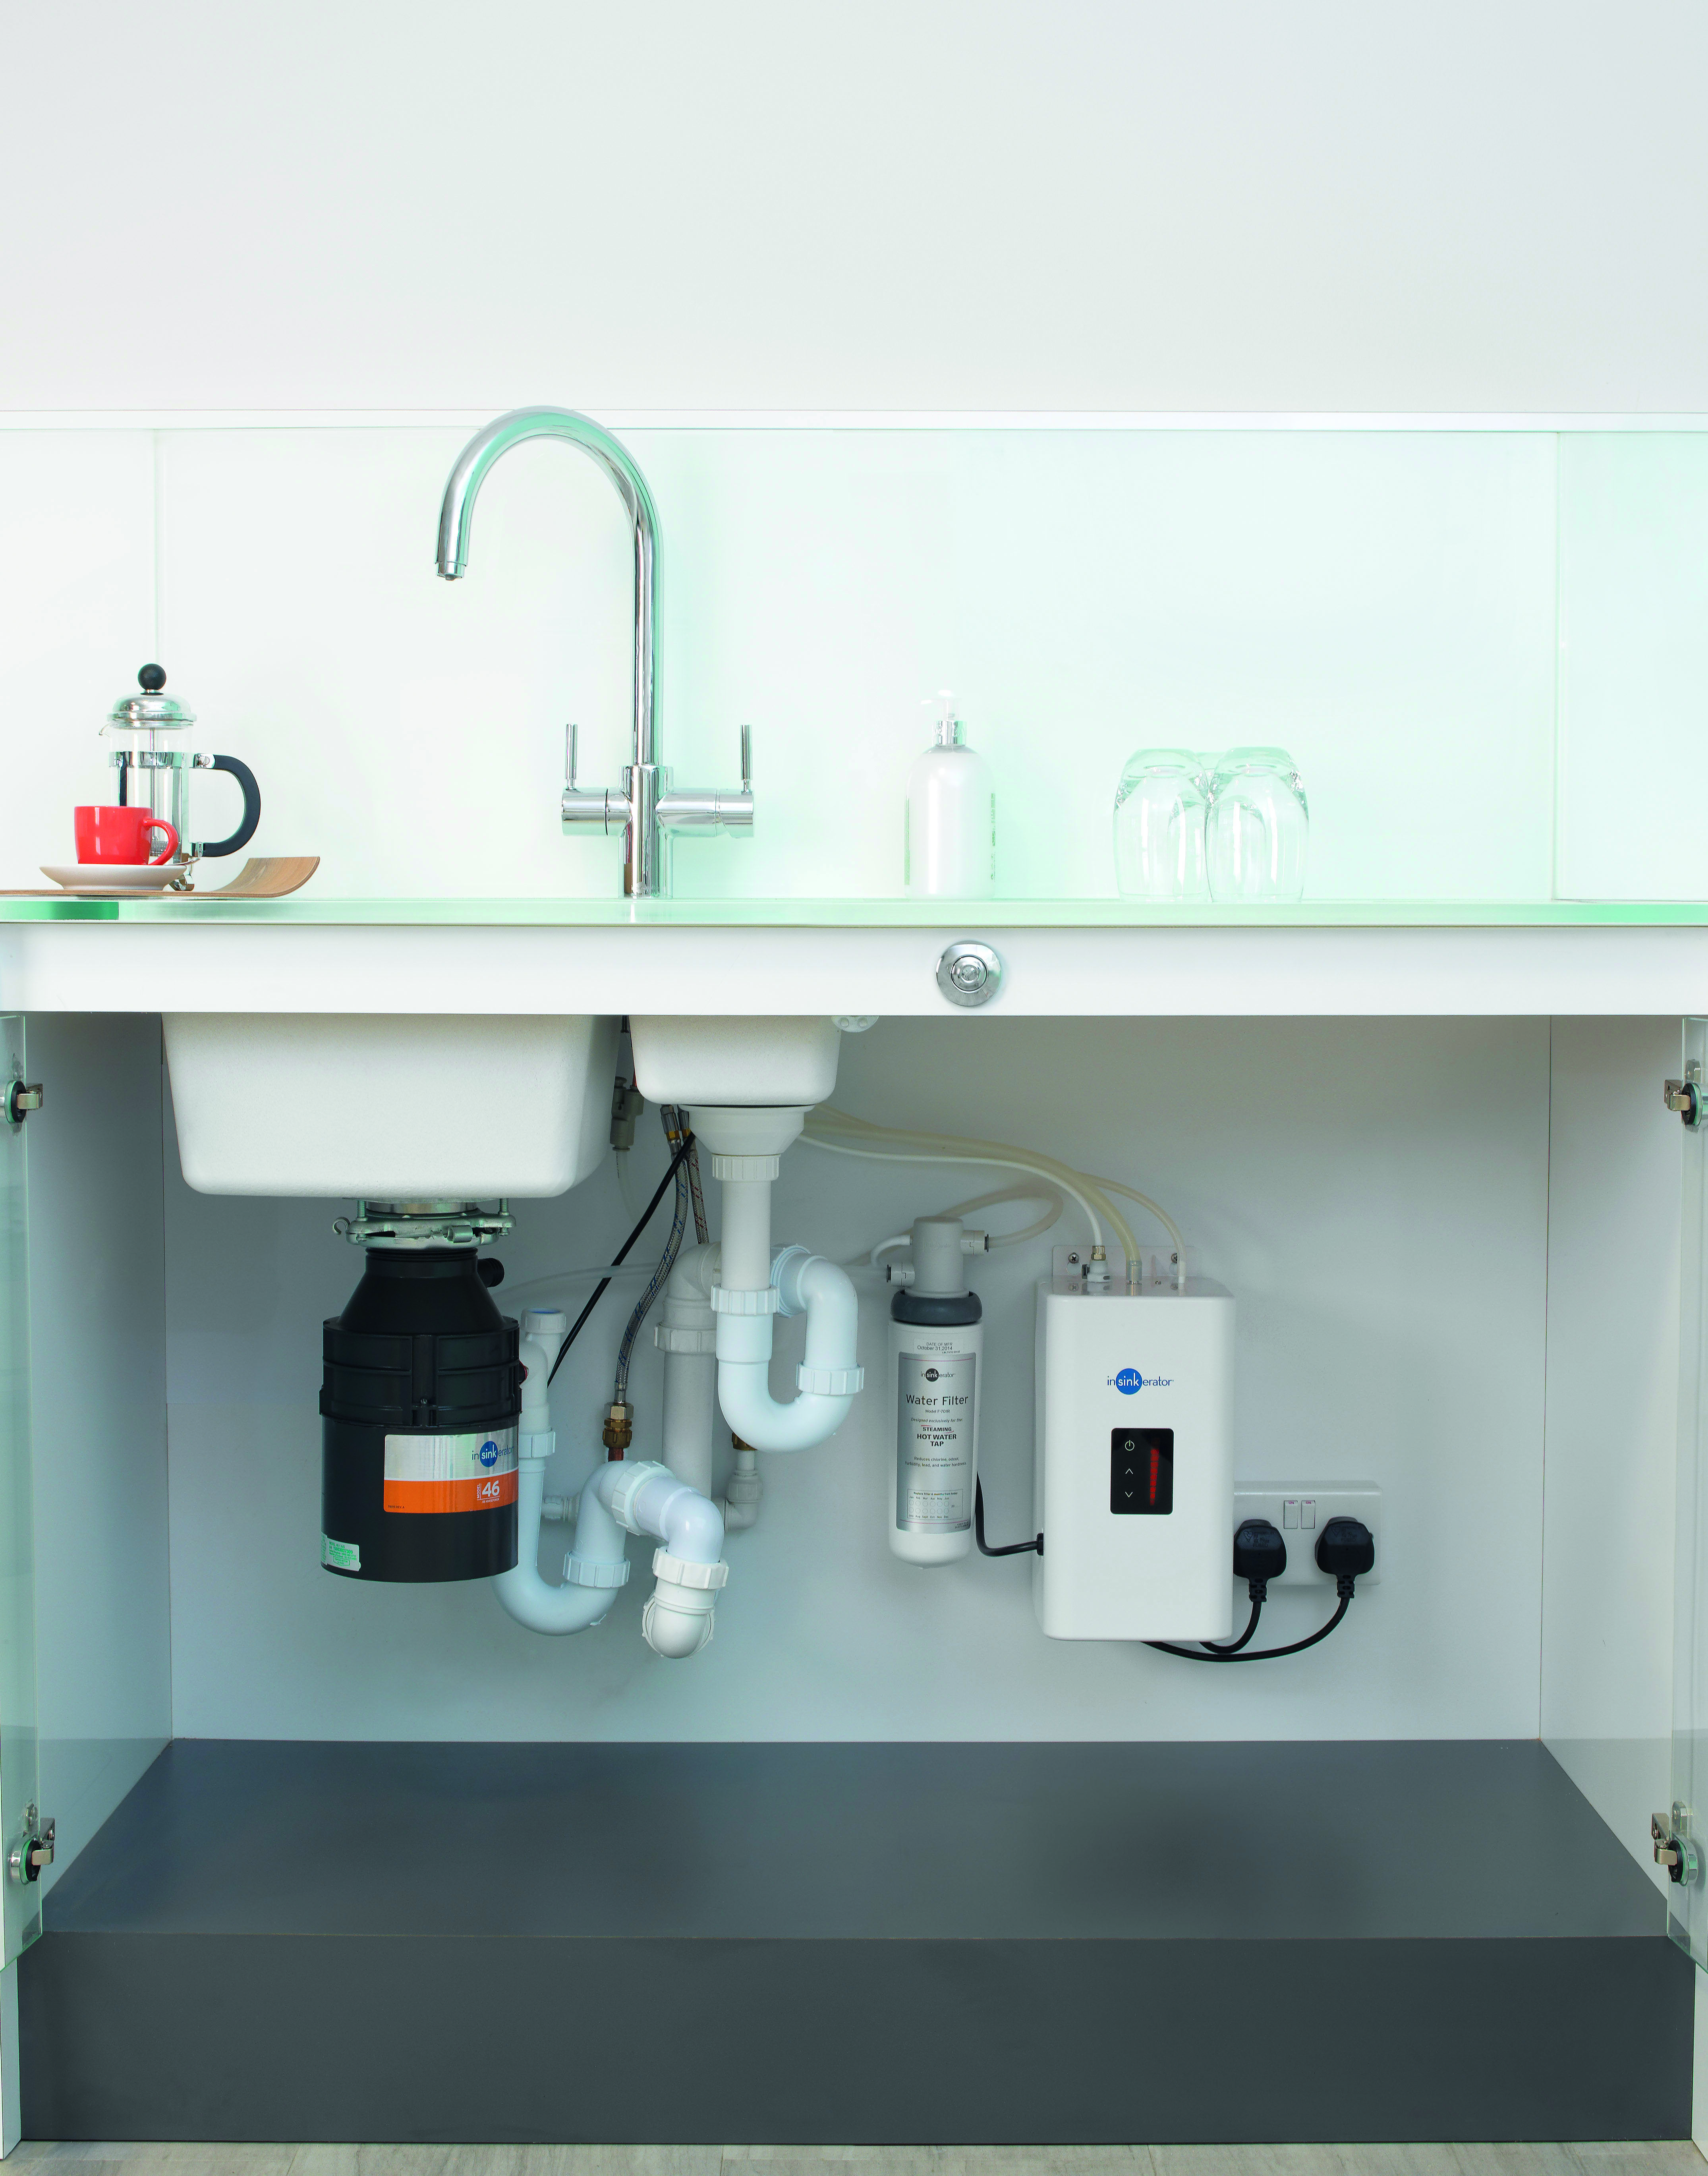 InSinkErator - Waste Disposer M Series - Model 46 - http://www ...